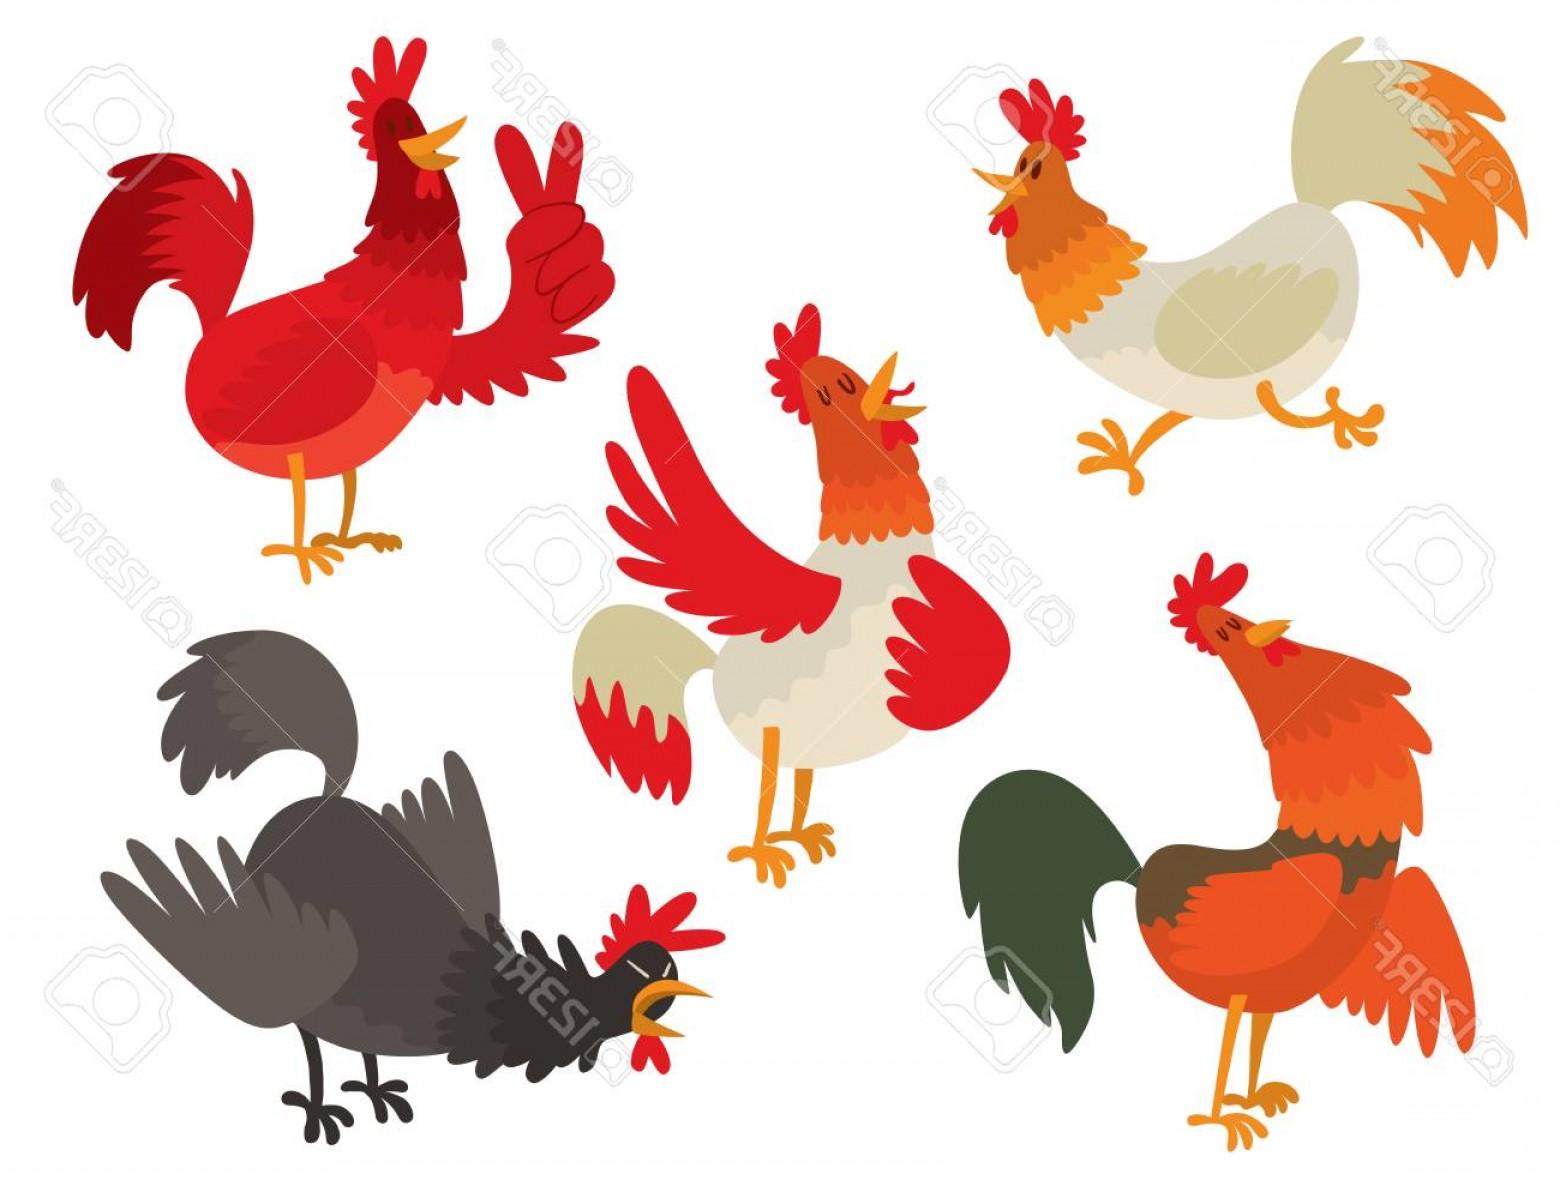 1560x1192 Vector Drawings Of Chicken Soidergi